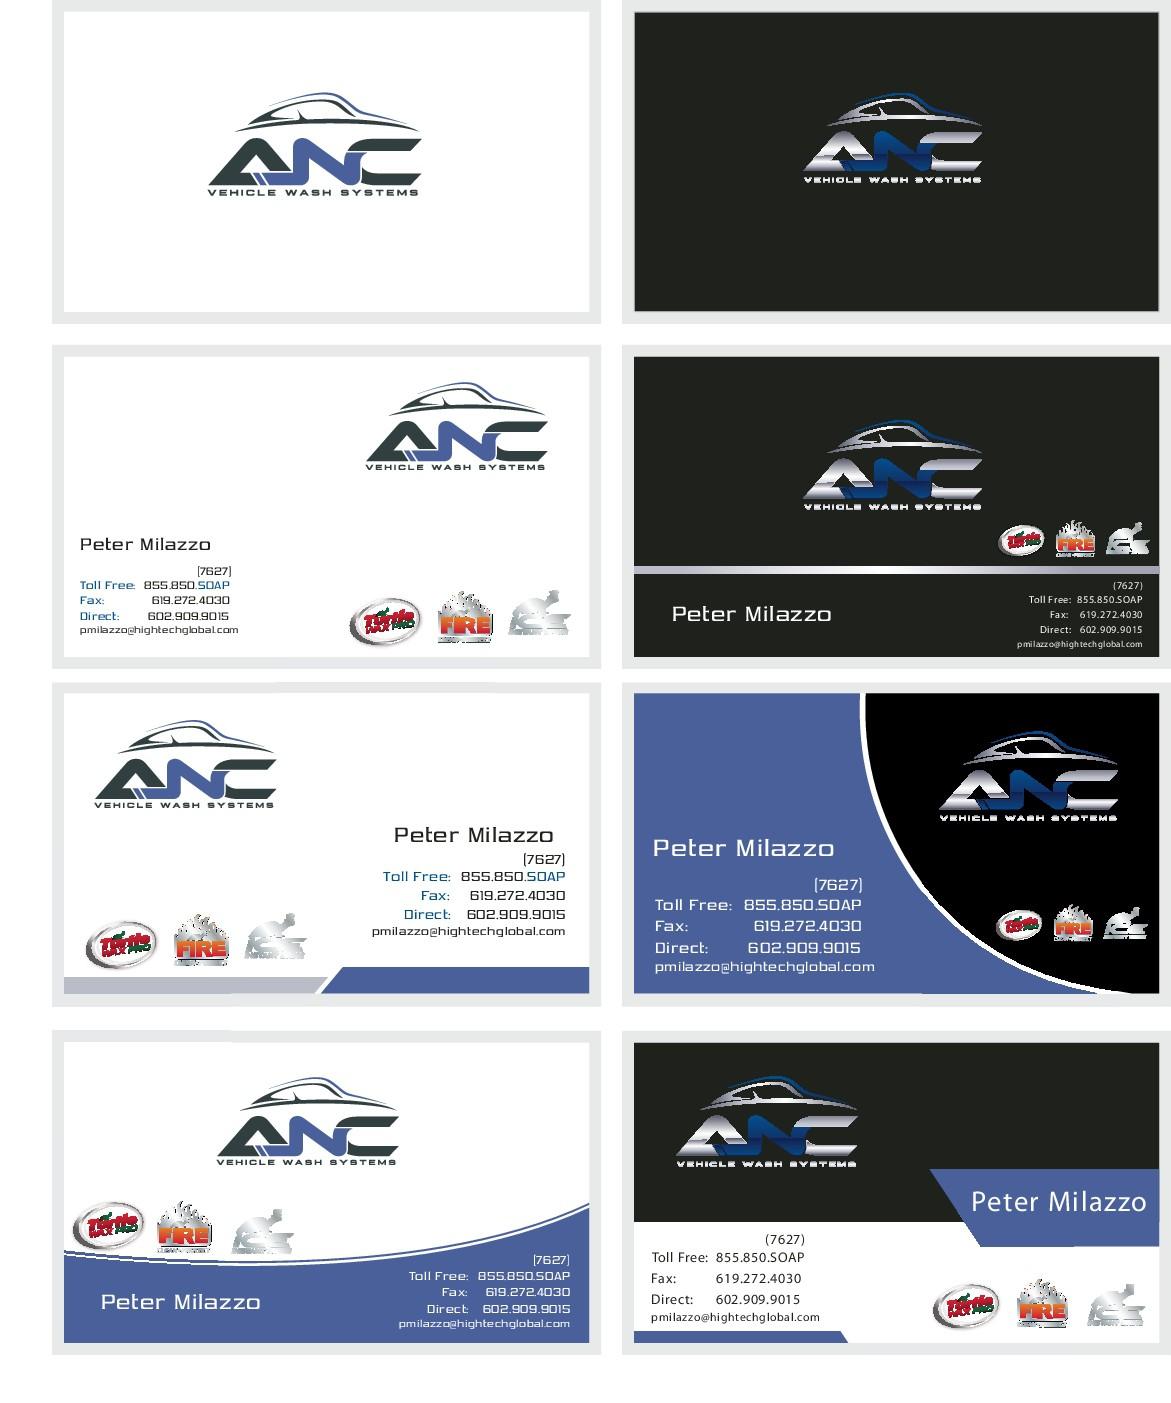 ANC Business Card Design